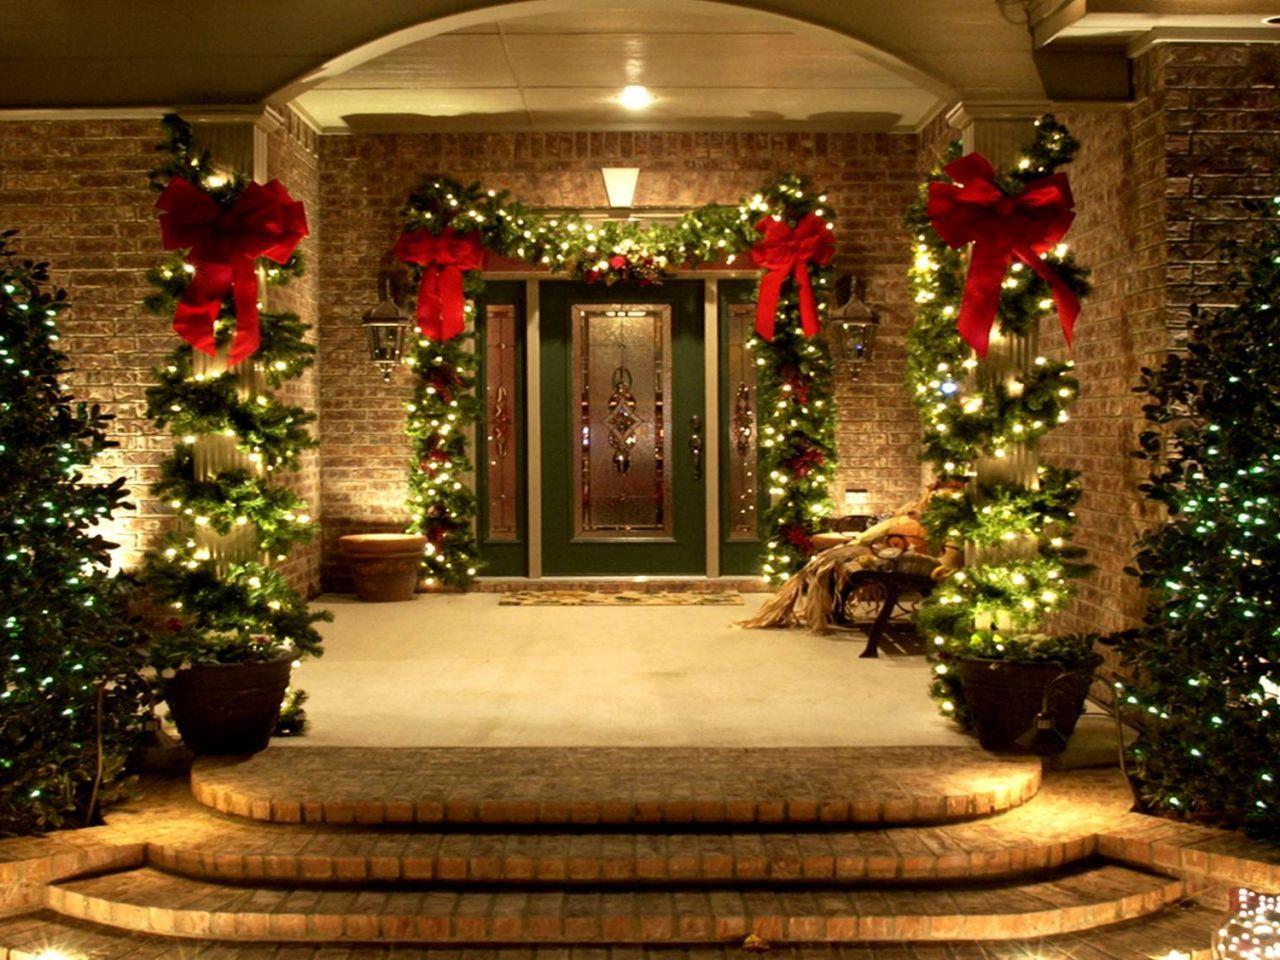 Home design home design outside christmas decorations uessnlze outside christmas decorations uessnlze christmas trees decorated outside christmas trees